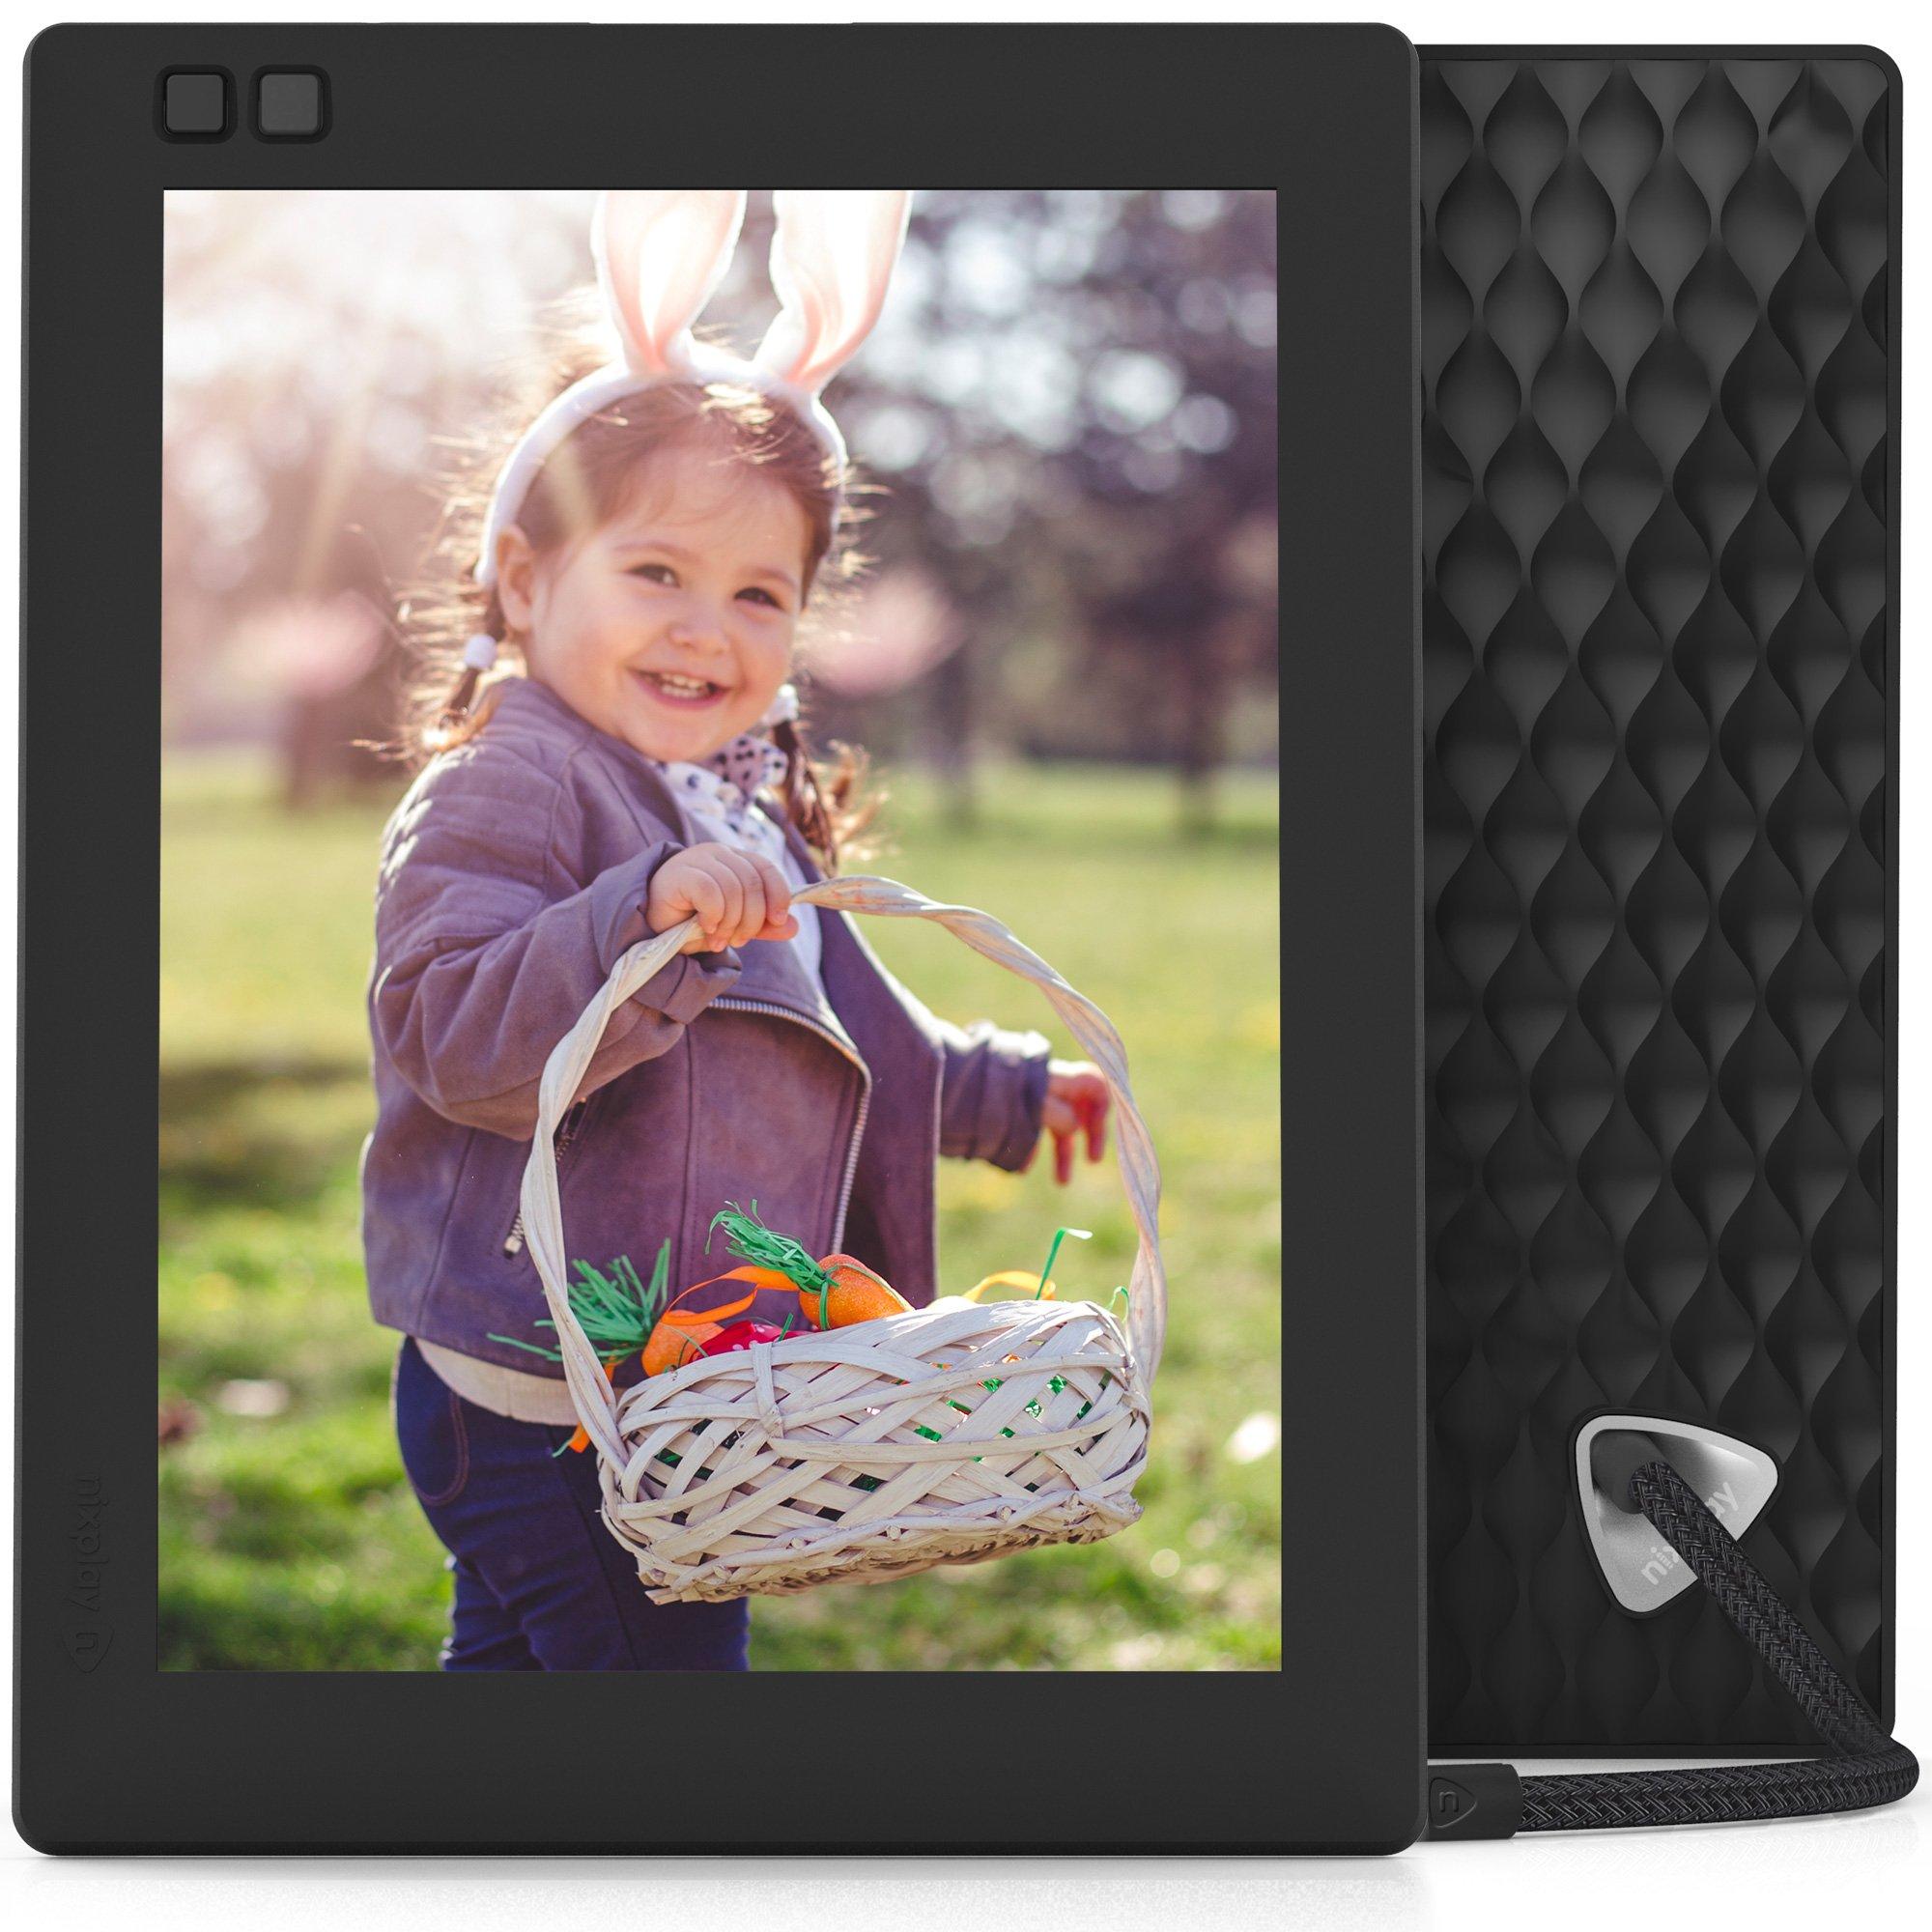 Nixplay Seed 8 inch WiFi Digital Photo Frame - Black by nixplay